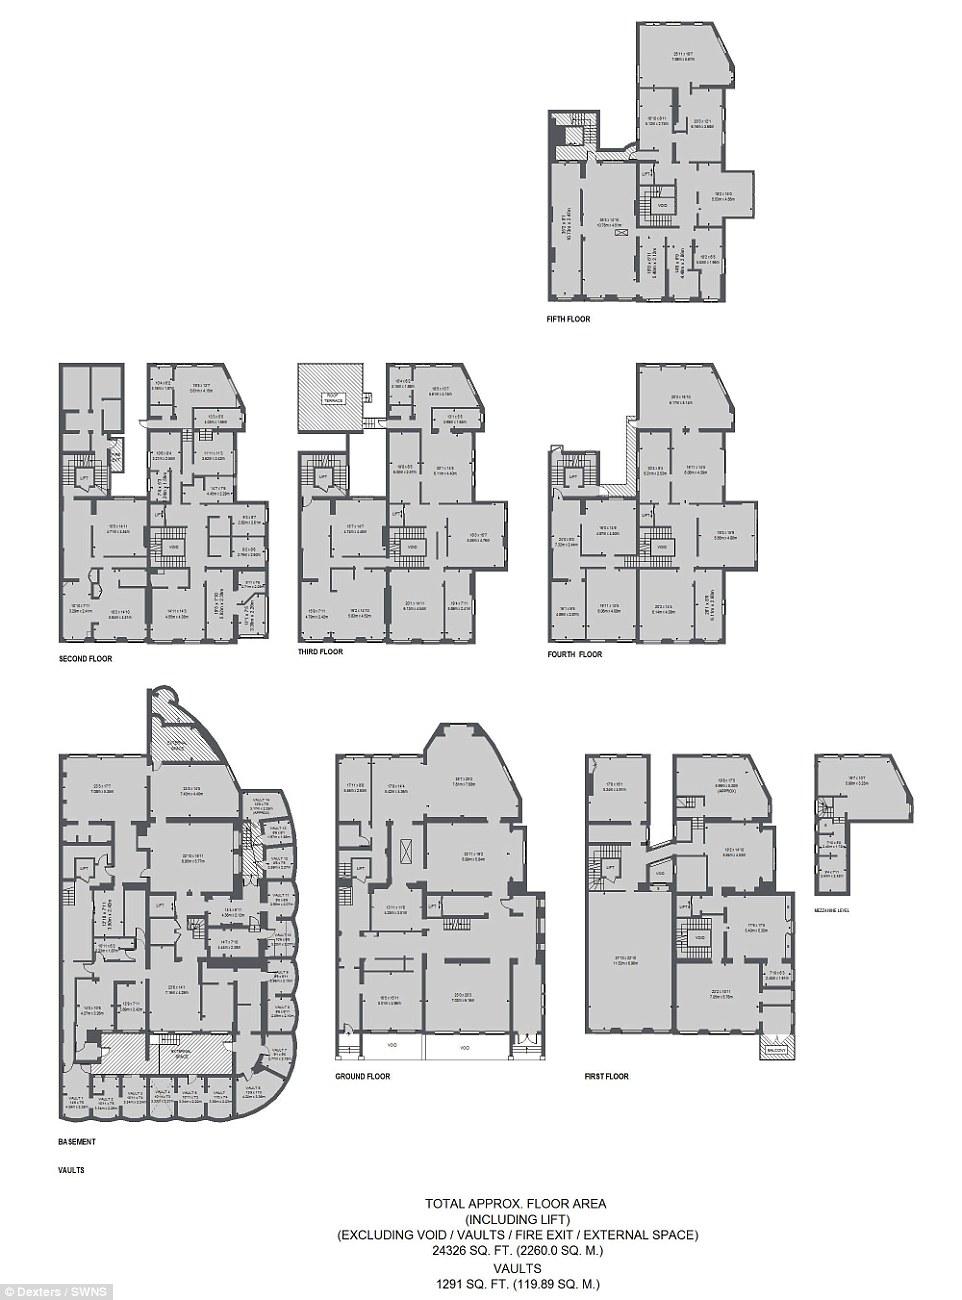 Lancaster Gate,United Kingdom,Block / Multi Property,1081